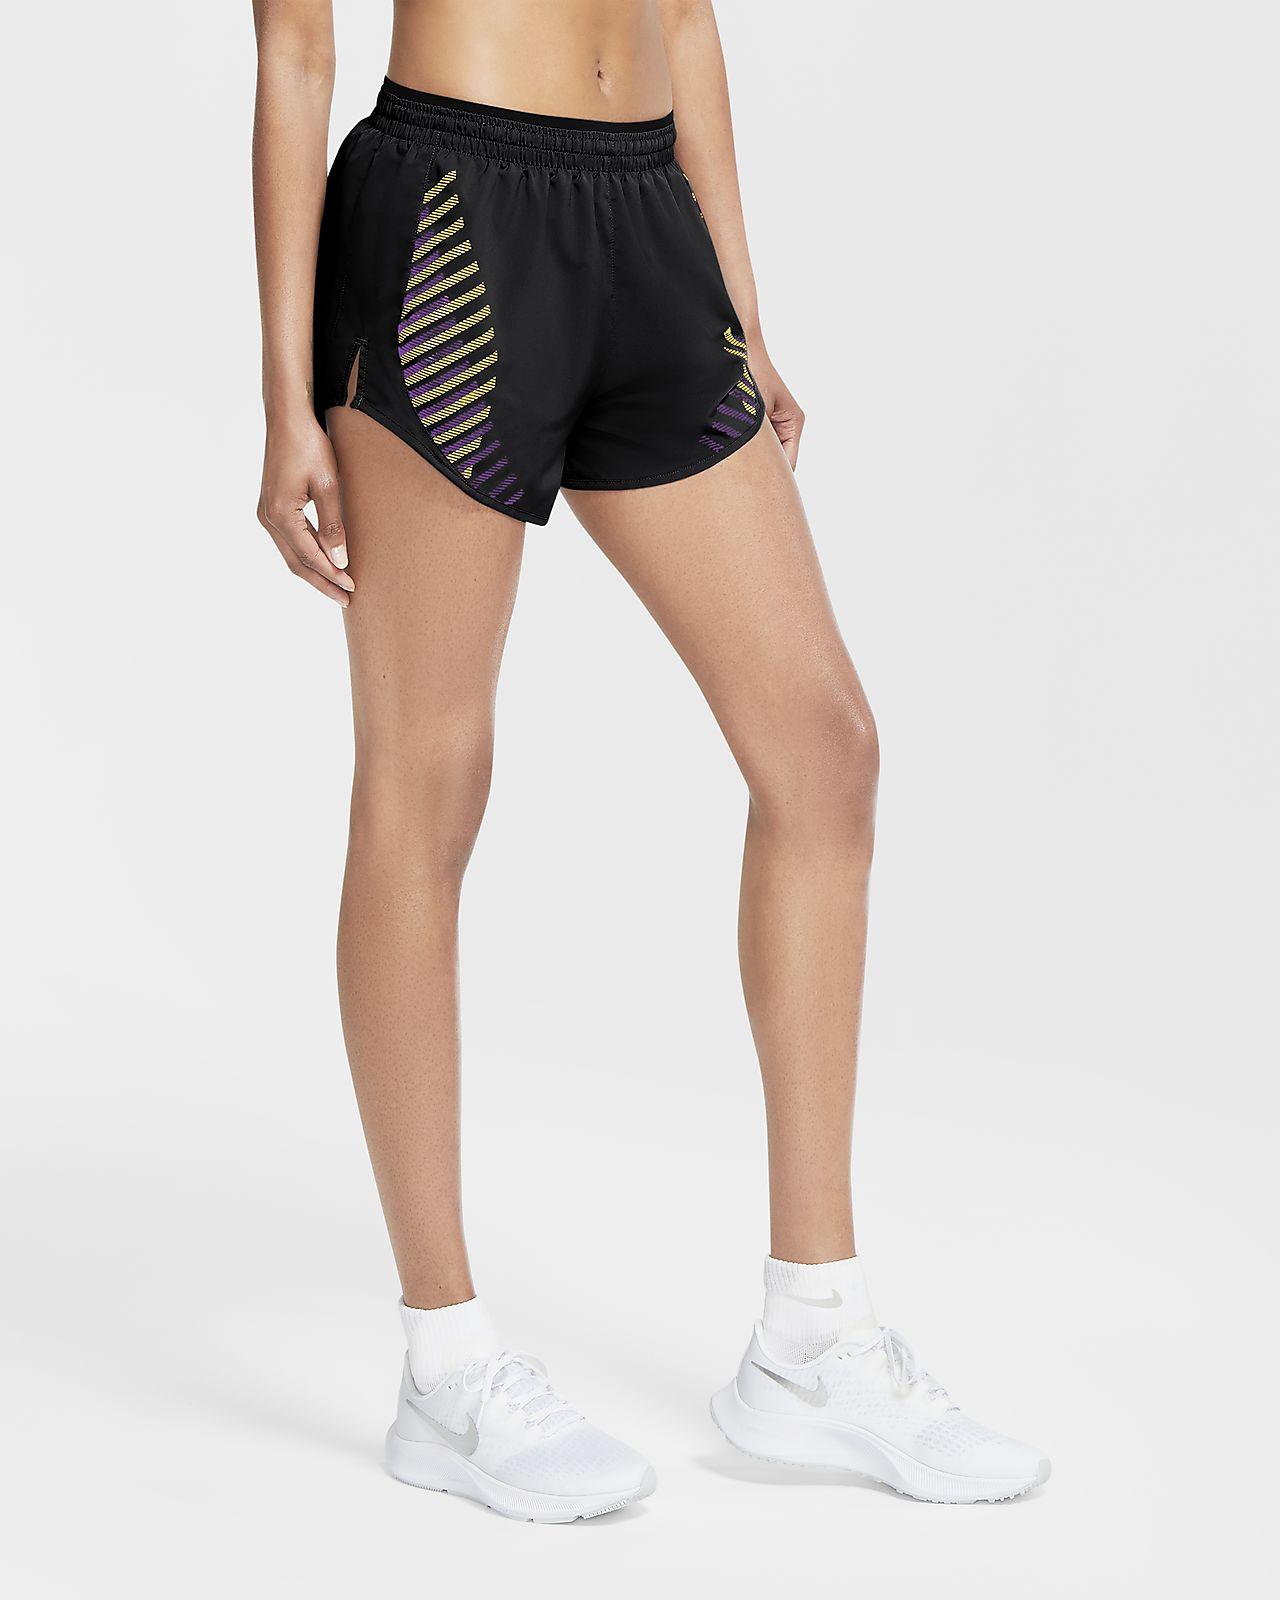 Nike Tempo Luxe Kadın Koşu Şortu